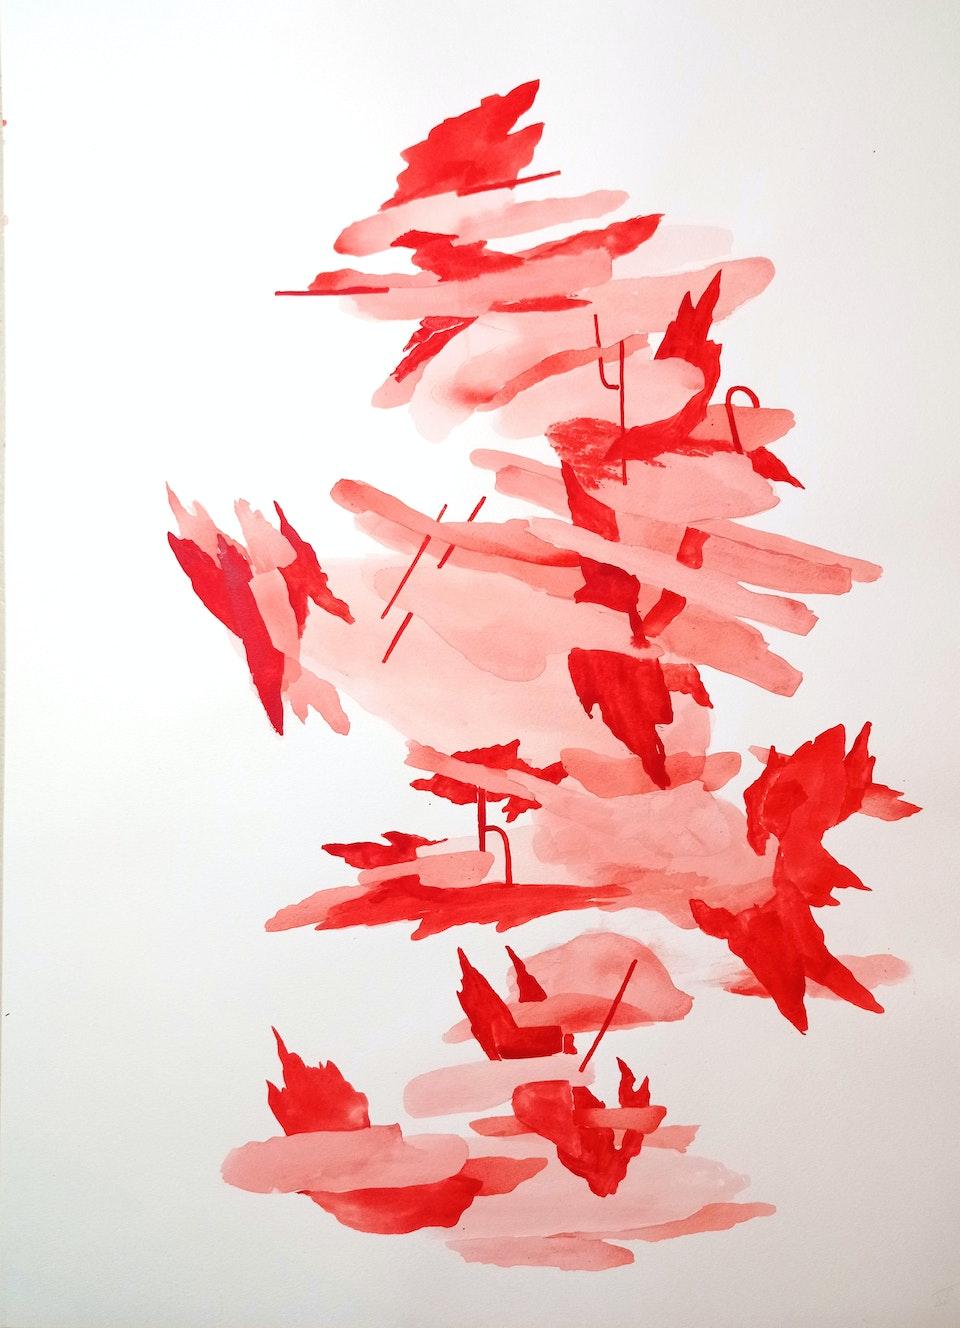 Blaze III_2021_Justin Southey - Justin Southey 2021 Blaze III Acrylic ink on paper 75cm x 55cm  ZAR 20 500